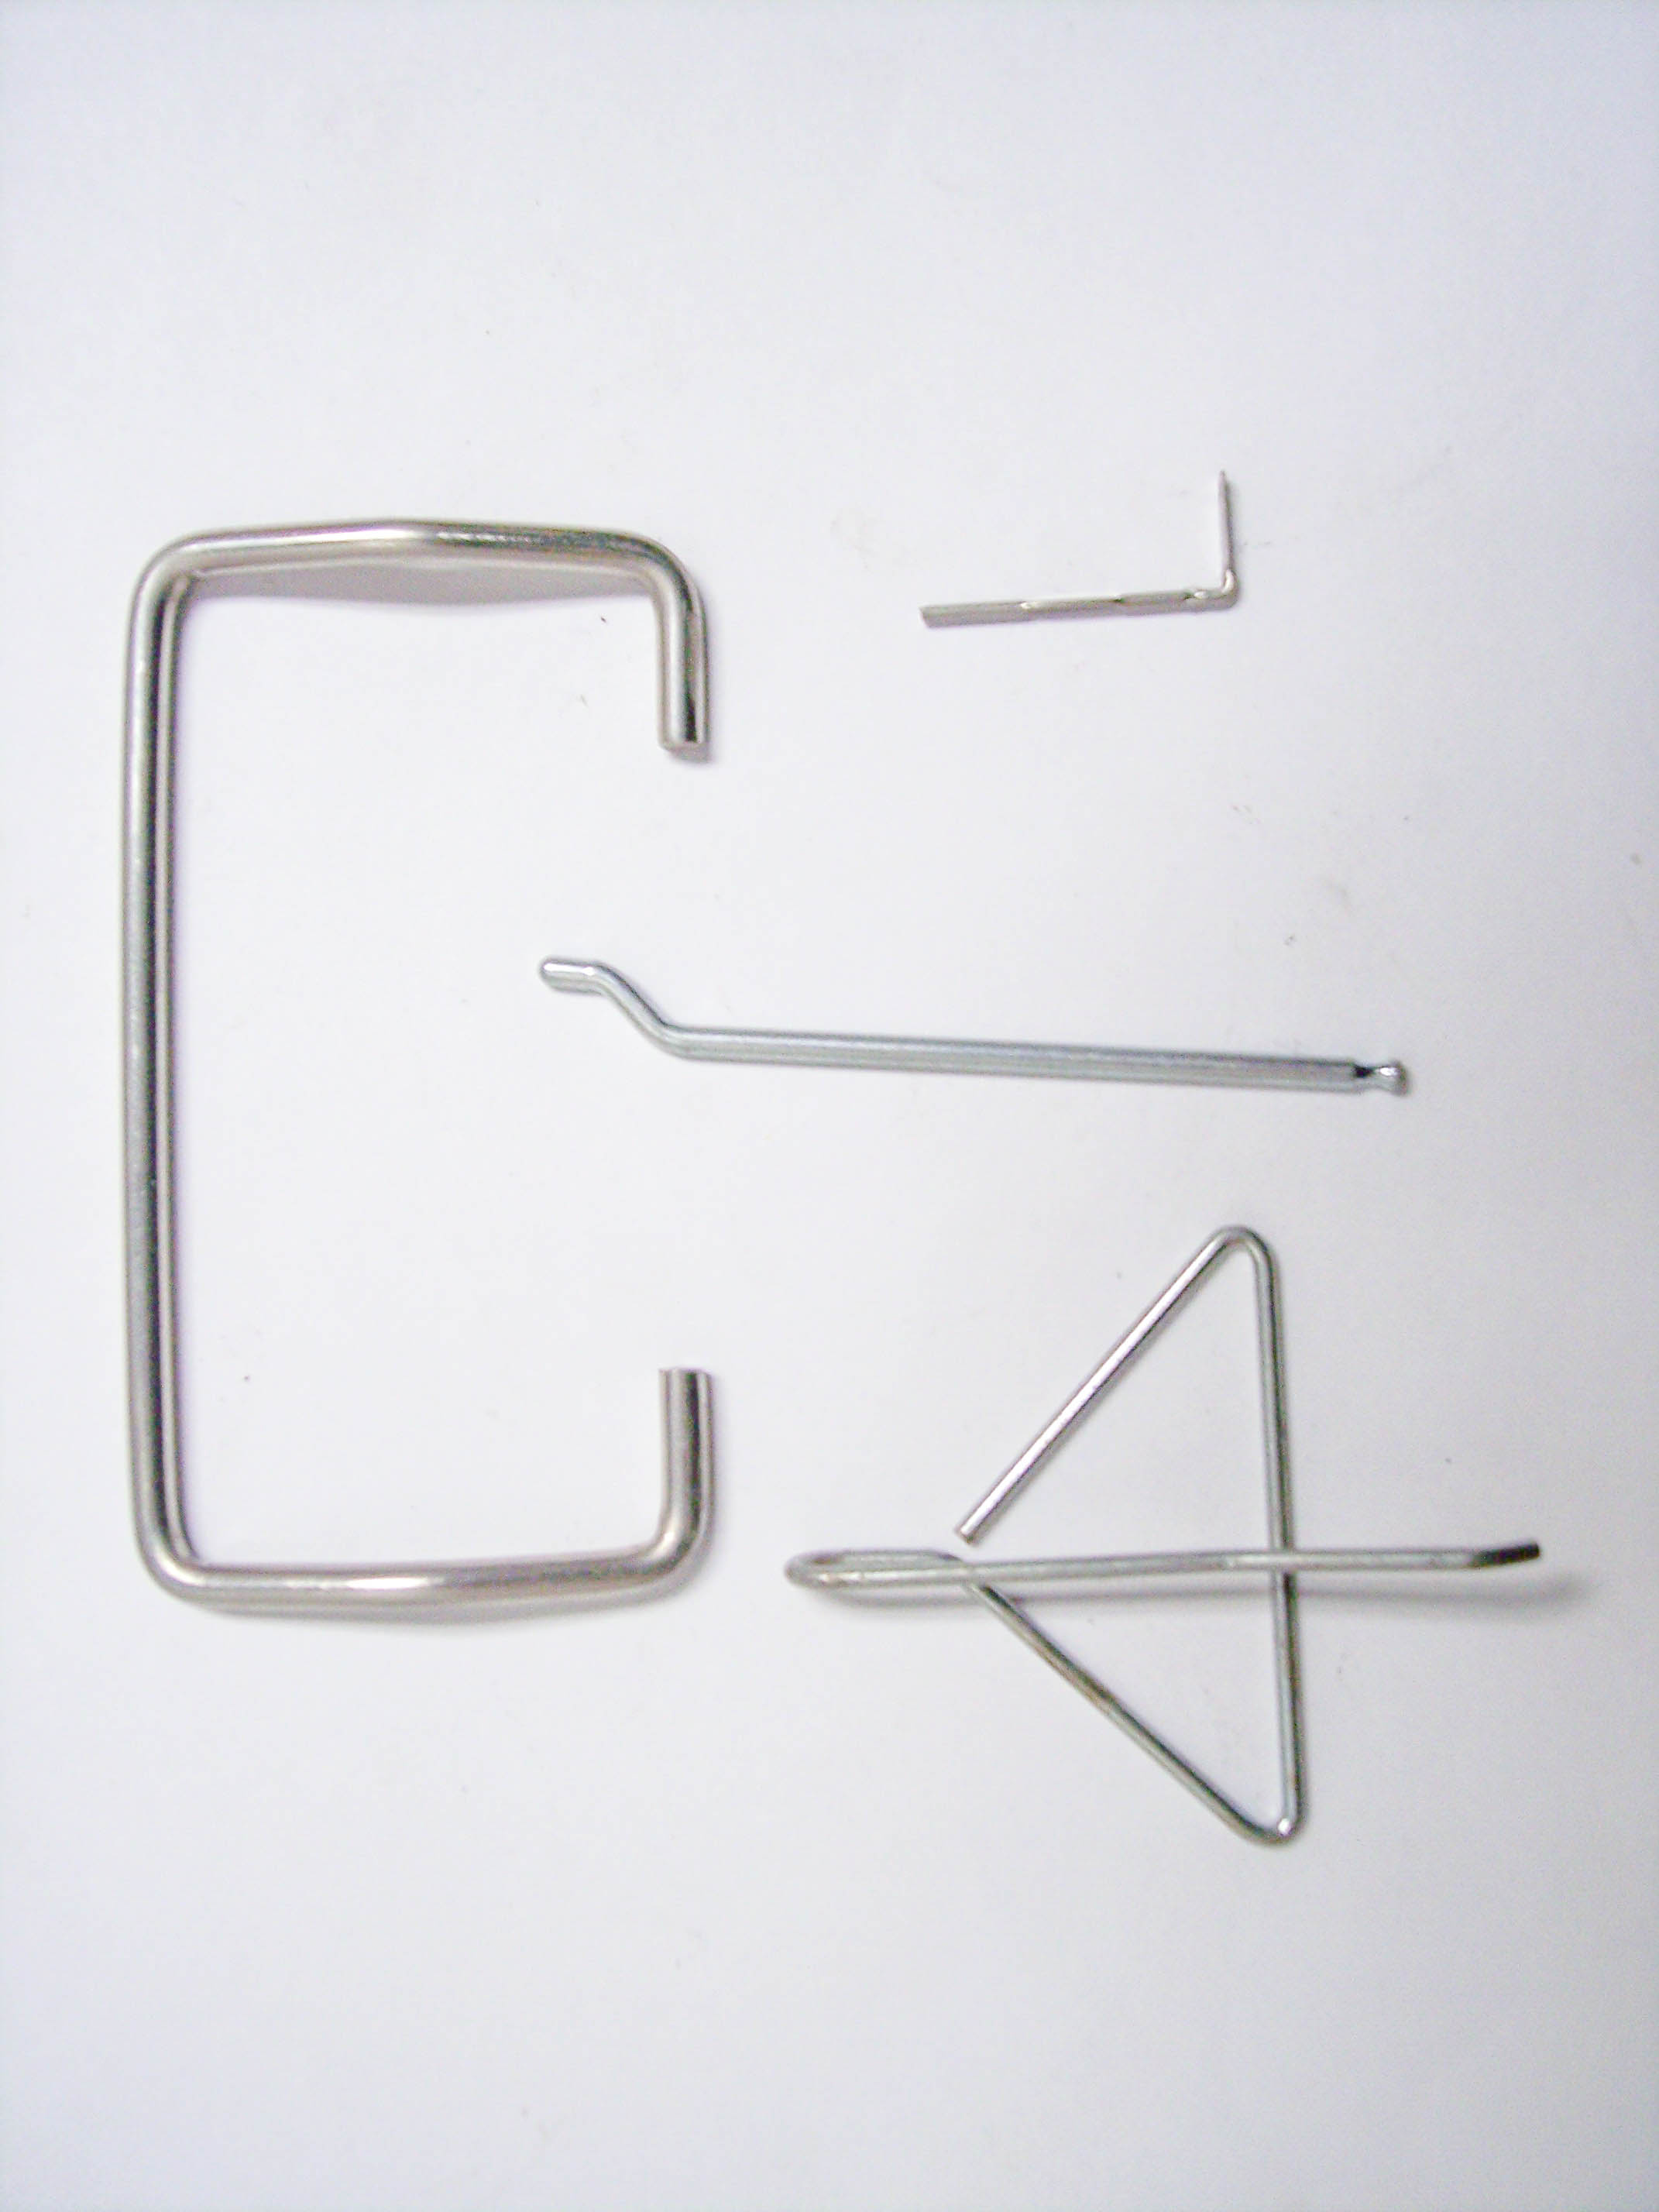 wireform3-lewel-tool.jpg